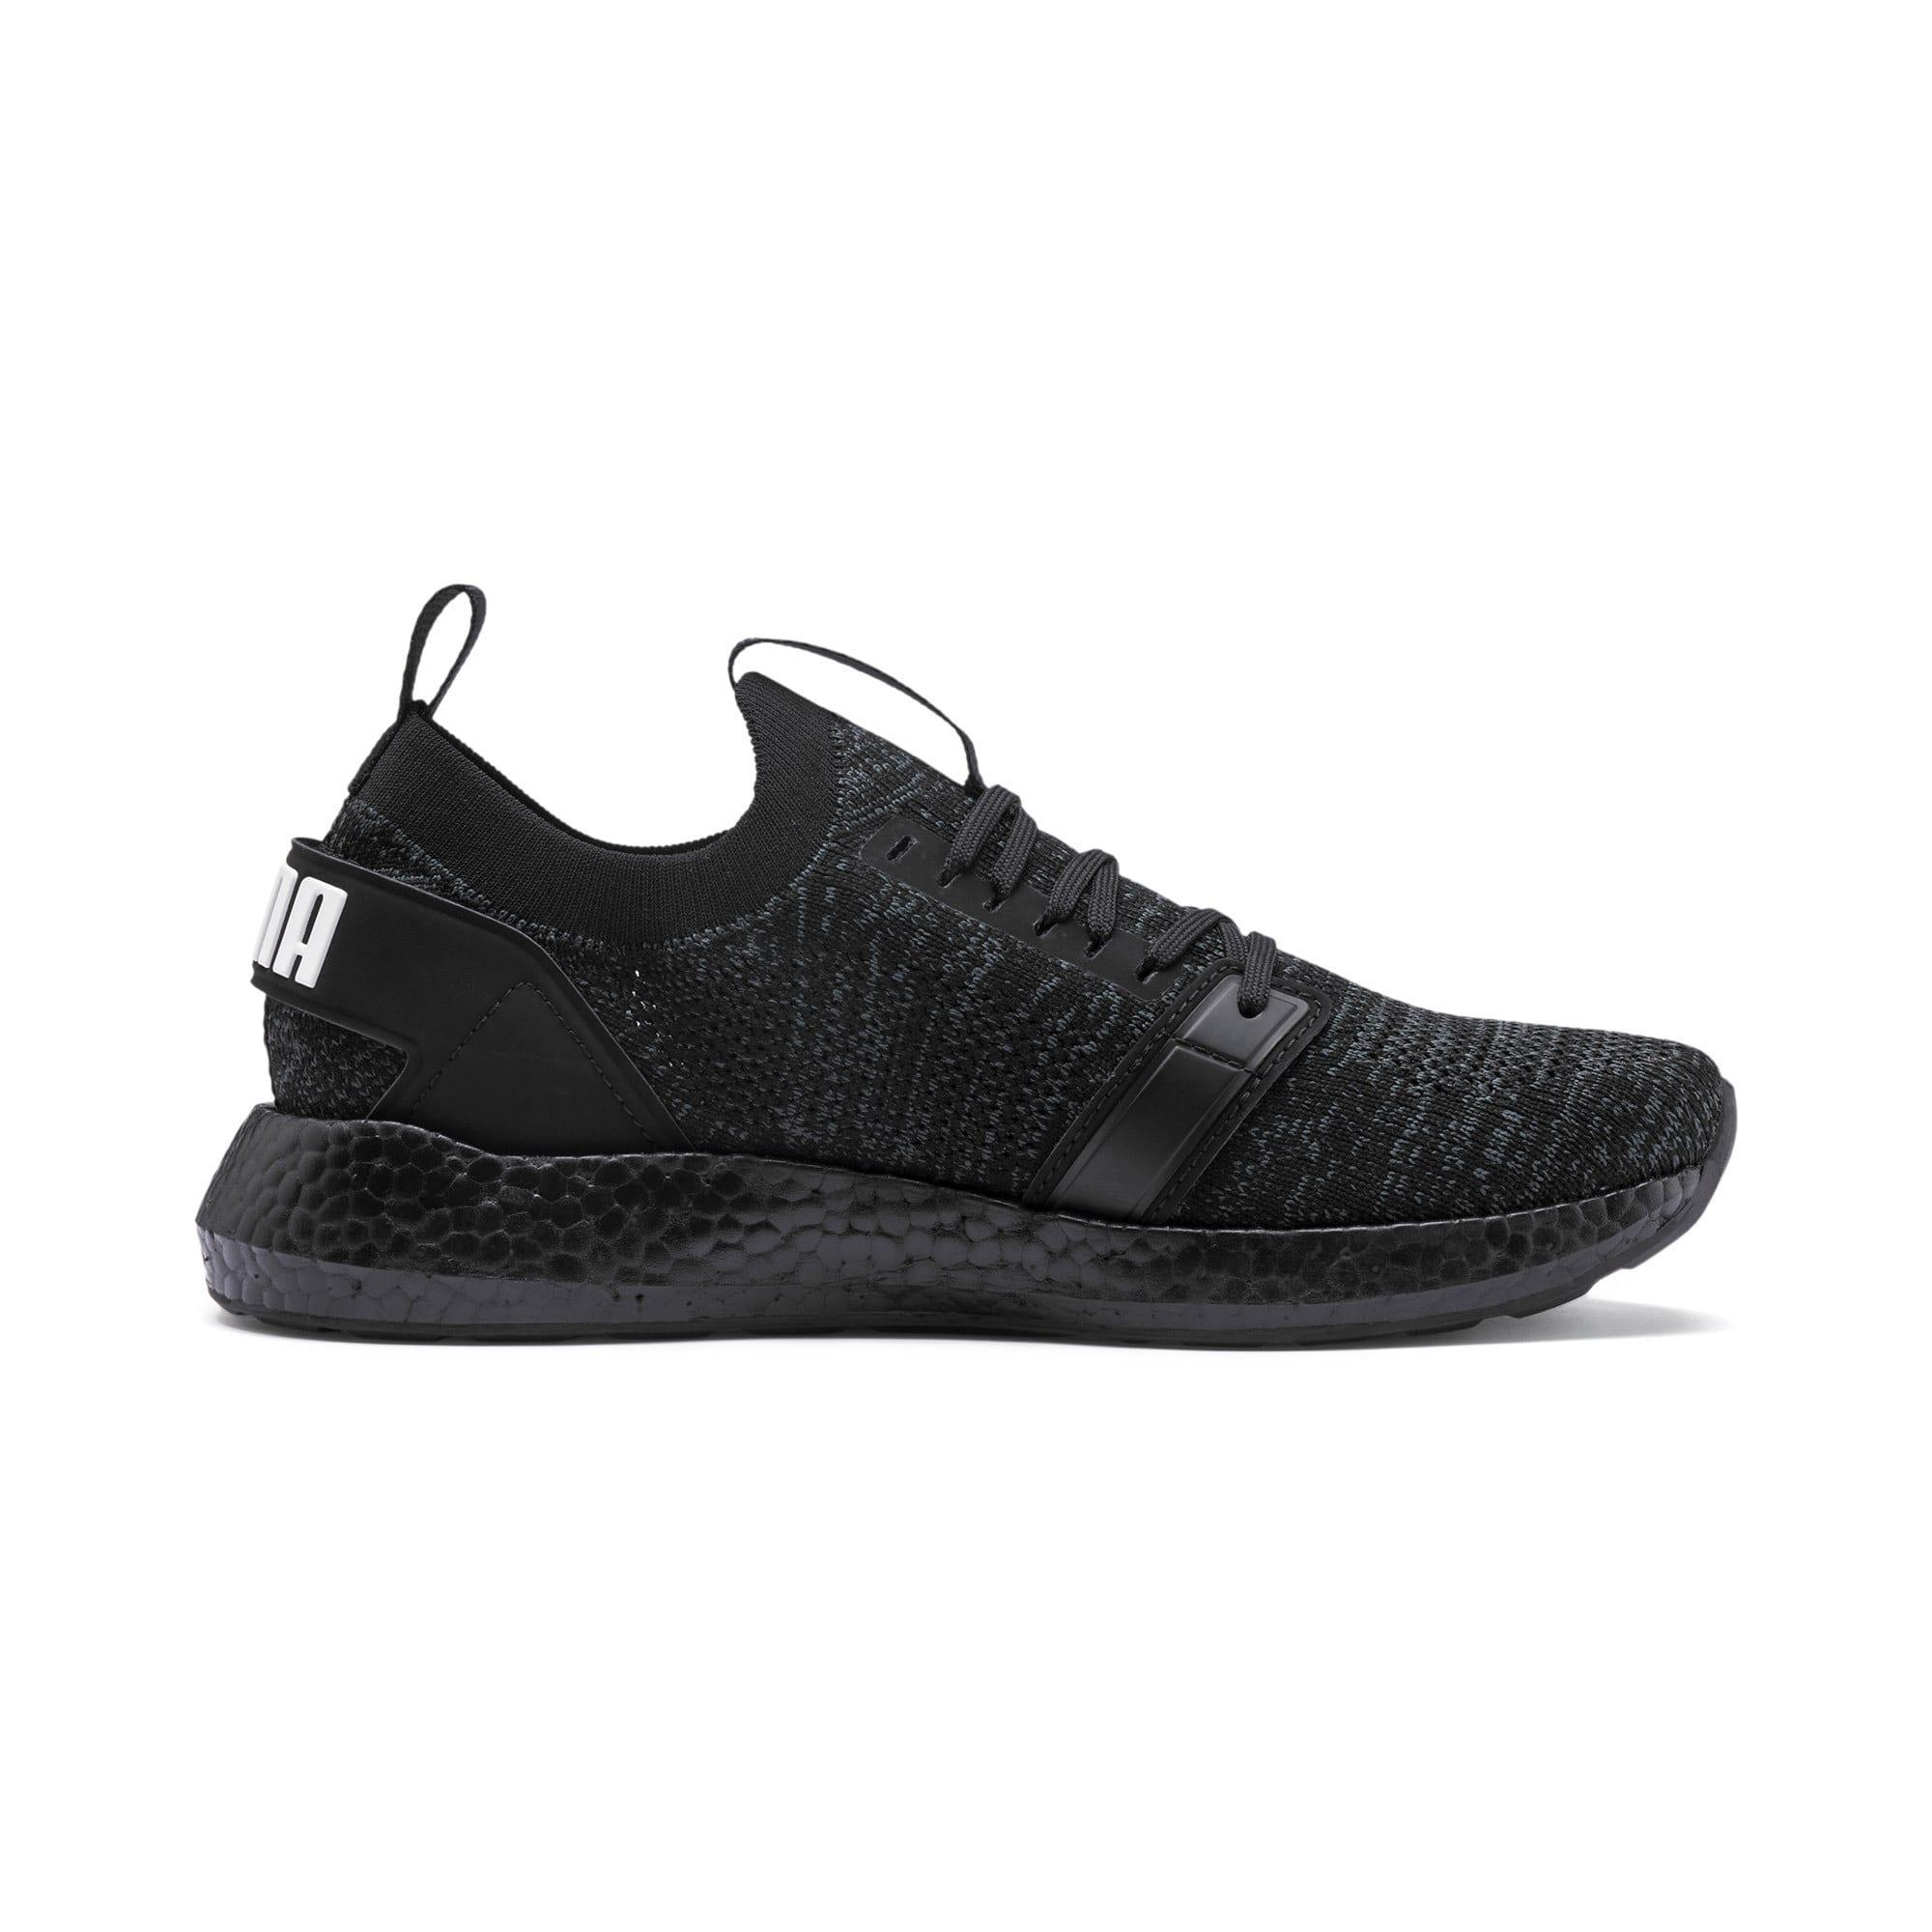 Thumbnail 6 of NRGY Neko Engineer Knit Women's Running Shoes, Puma Black-Puma Black, medium